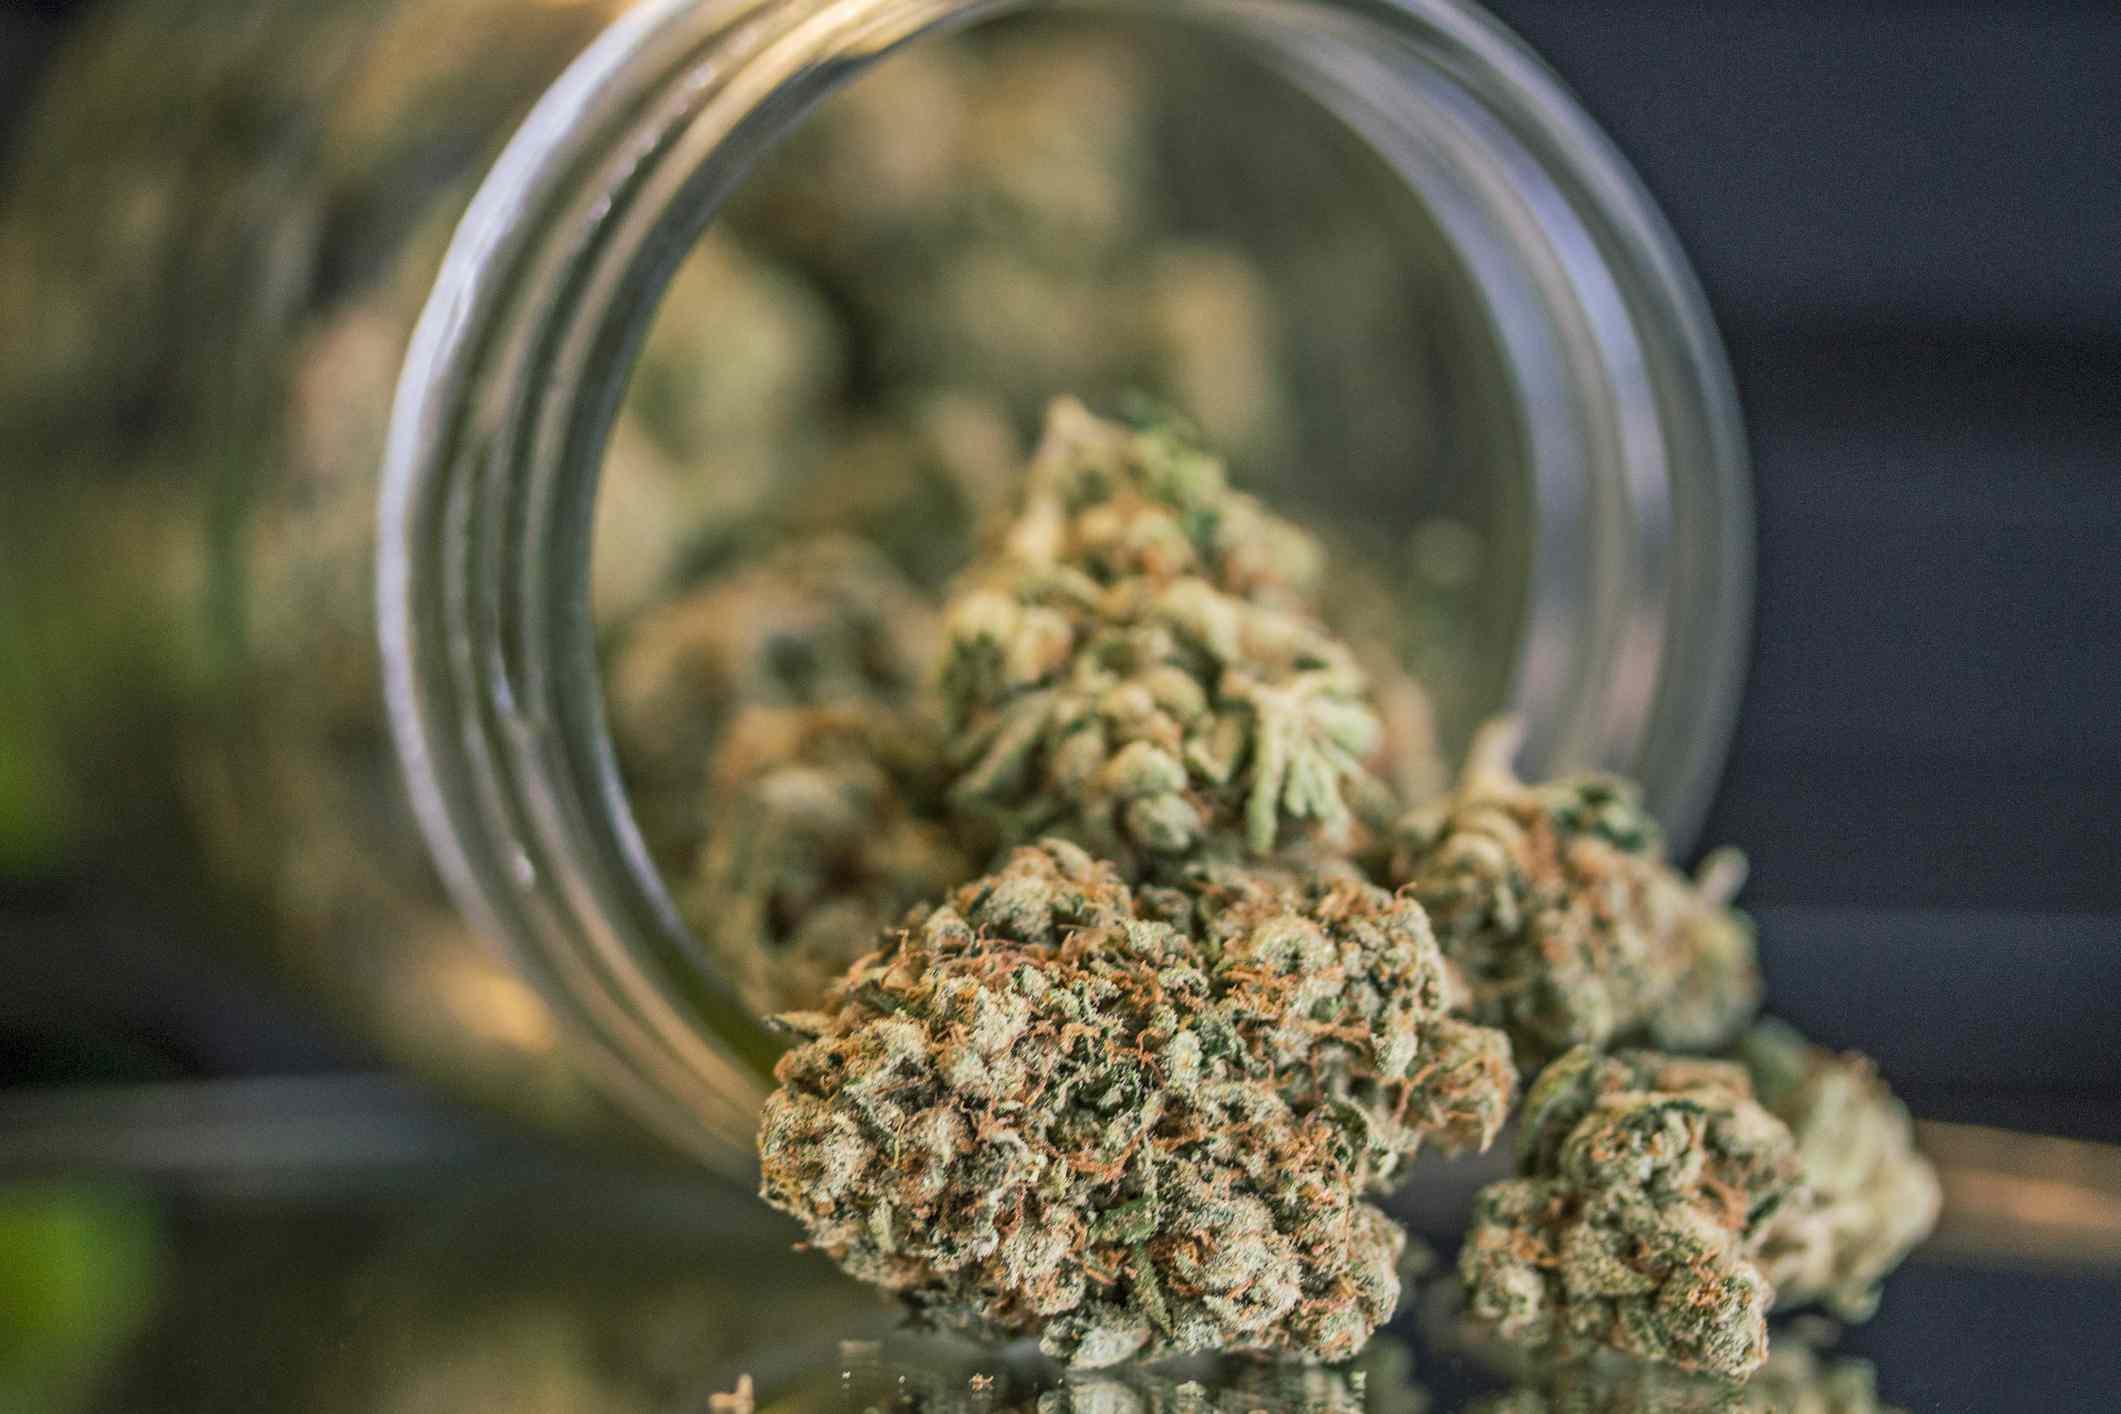 Close up of marijuana in mason jar